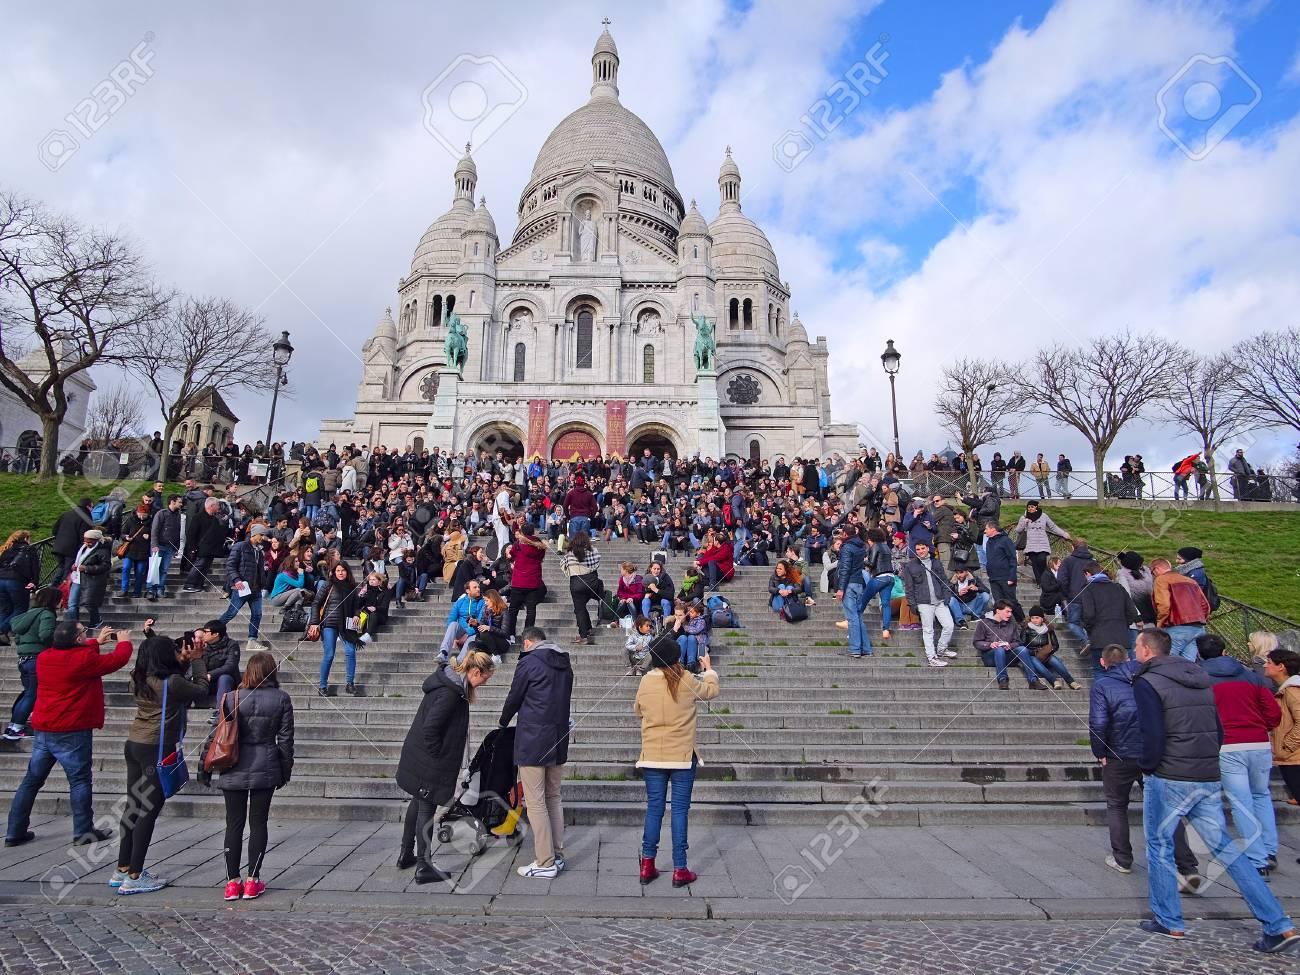 Paris, France, February 6, 2016: The Sacr